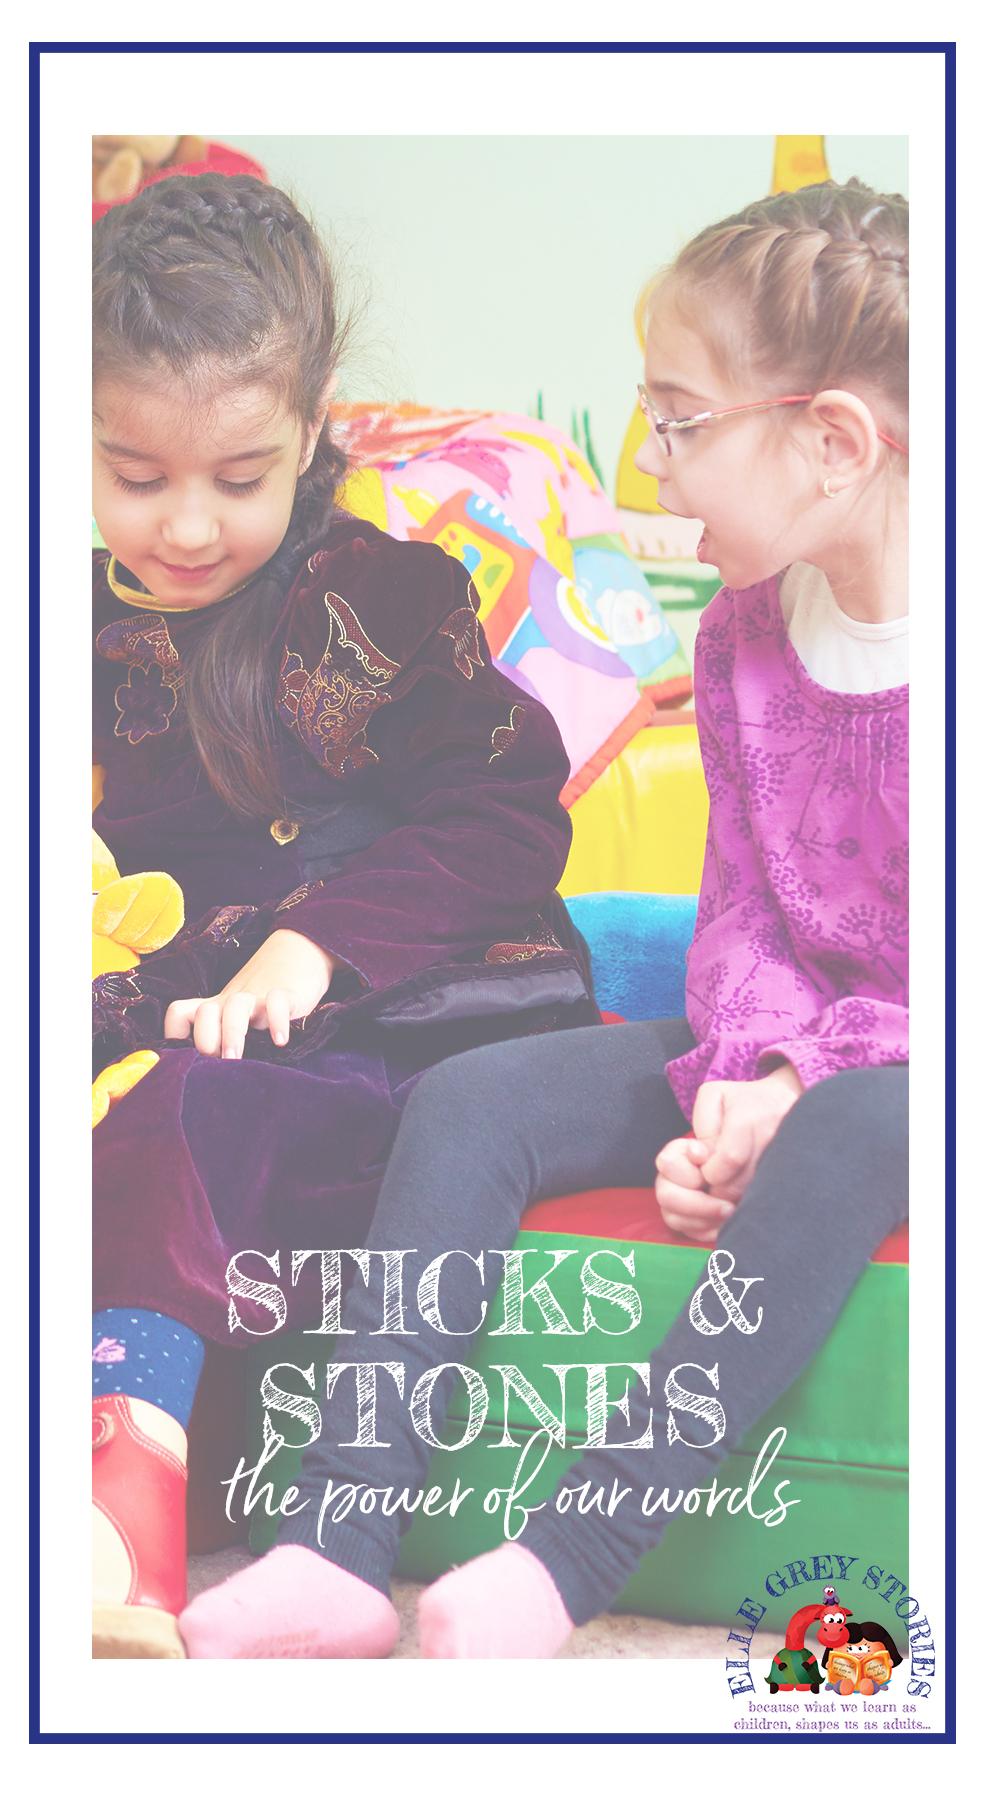 sticksandstones-pin.jpg